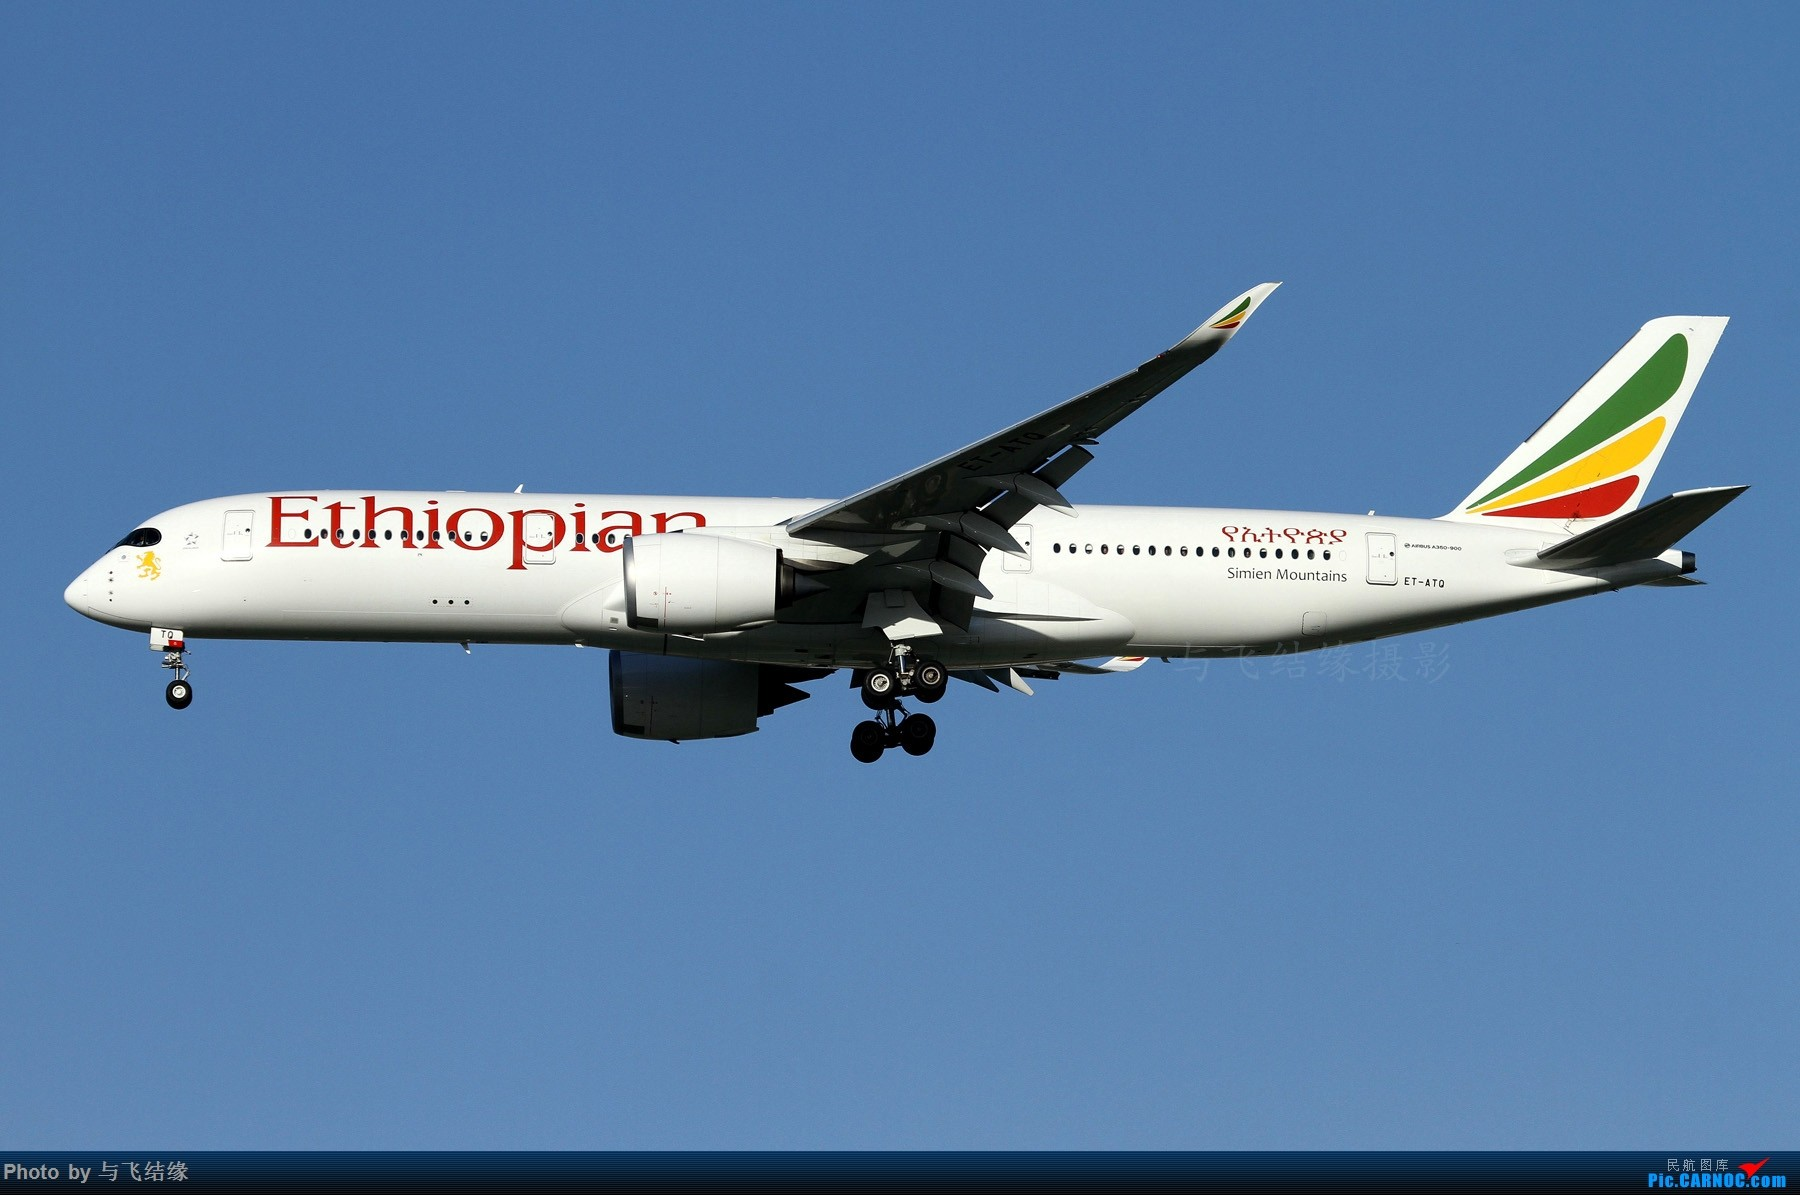 Re:[原创]端午发图之飞机飞机就要飞着拍才叫拍飞机! AIRBUS A350-900 ET-ATQ 中国北京首都国际机场